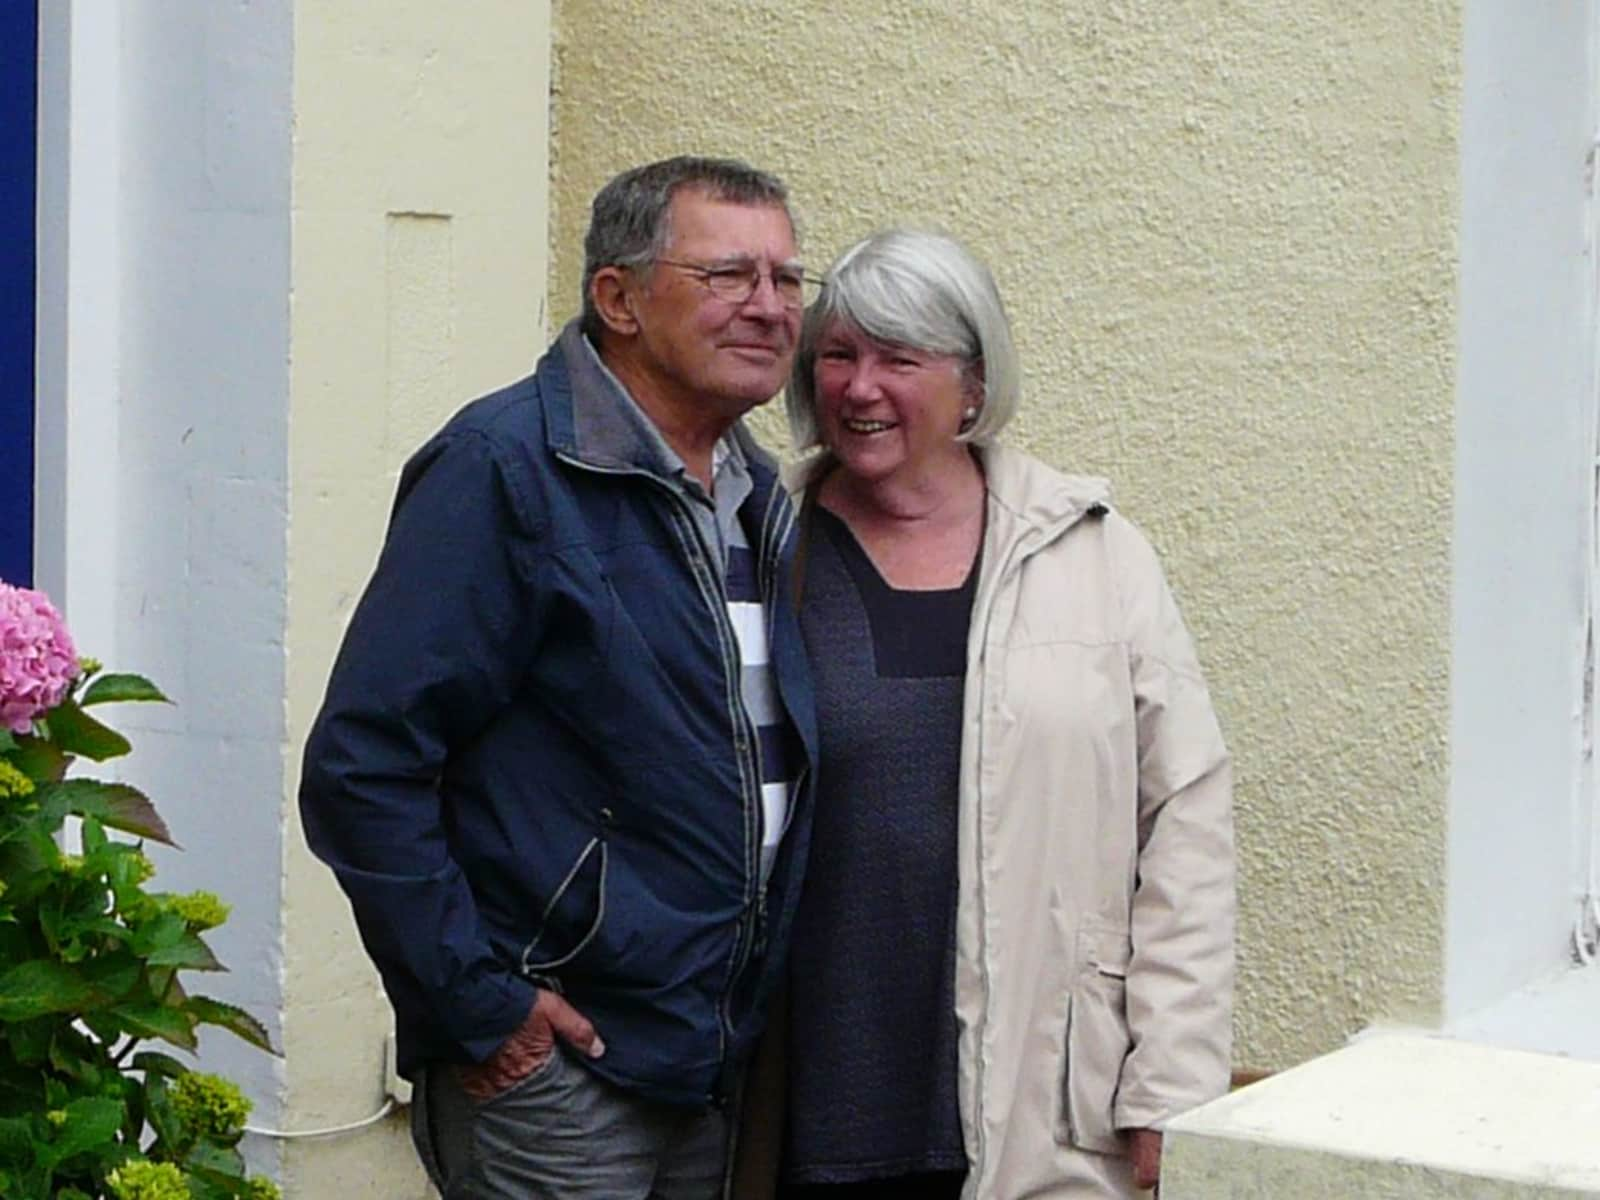 Rhondda & Robin from Terrigal, New South Wales, Australia